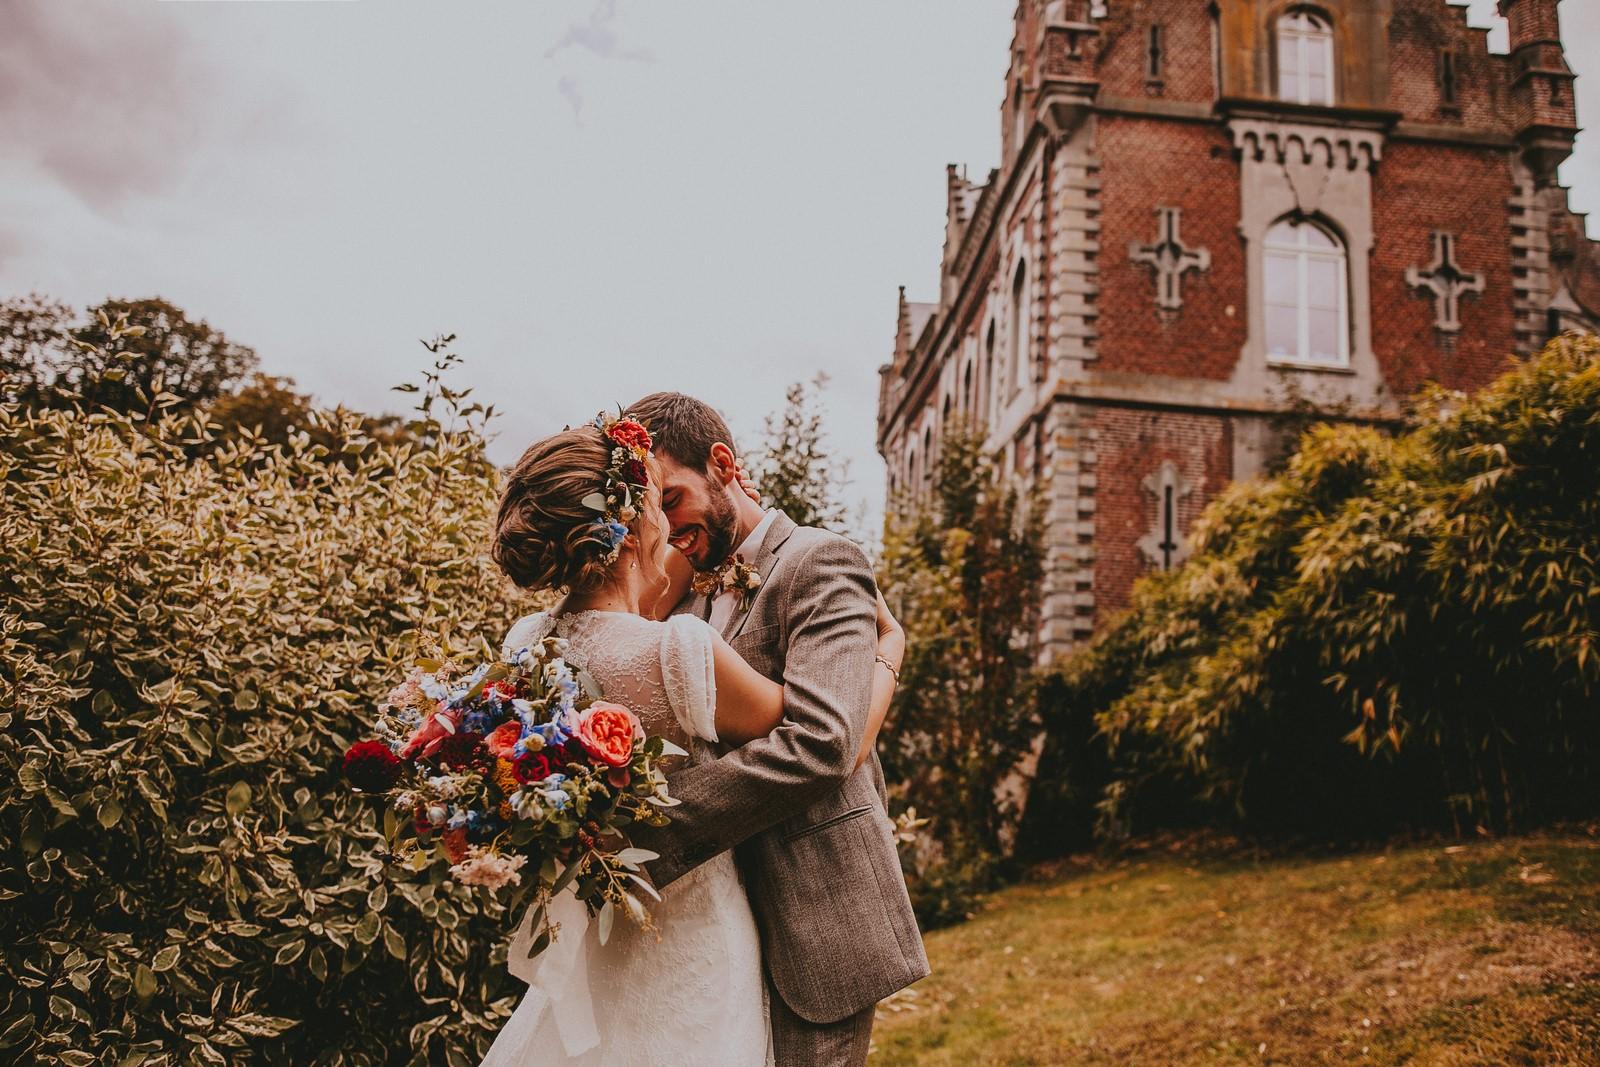 photographe mariage chateau de bourgogne 29